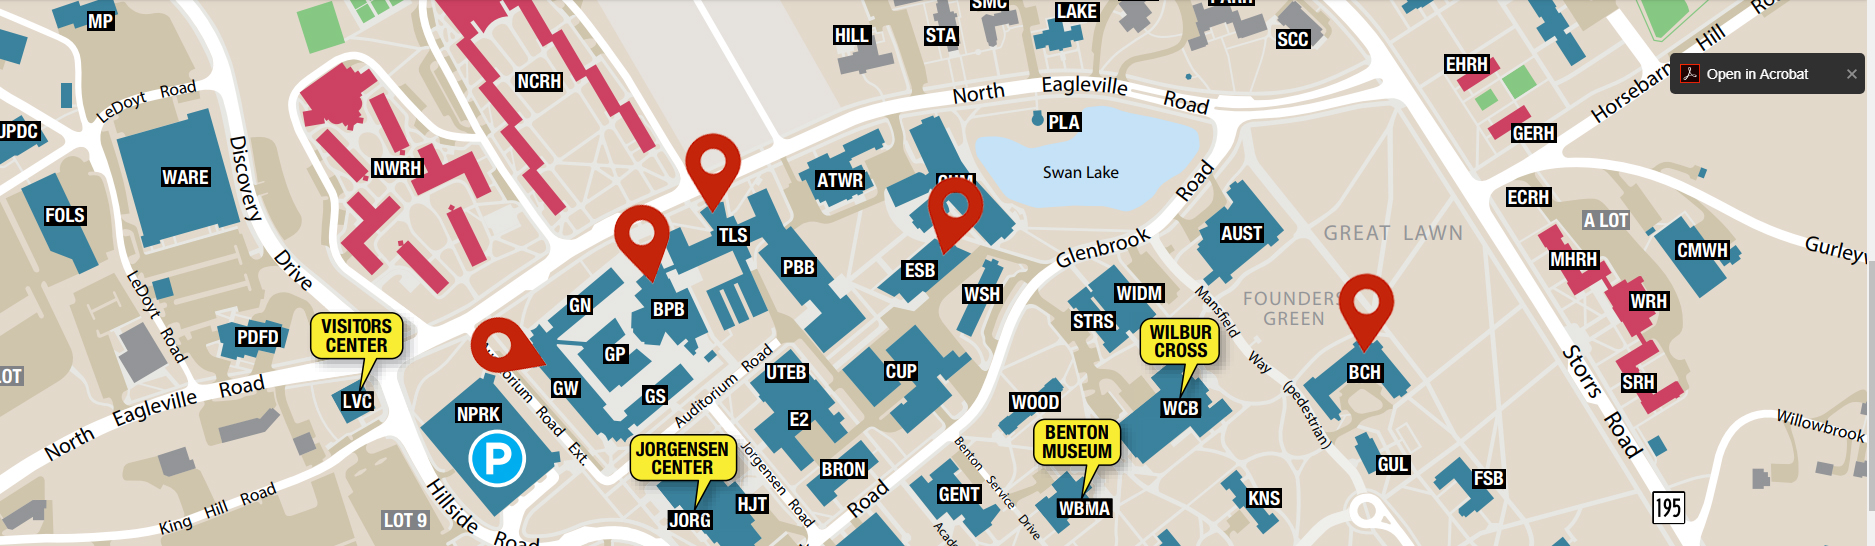 MCB_Locations_Map